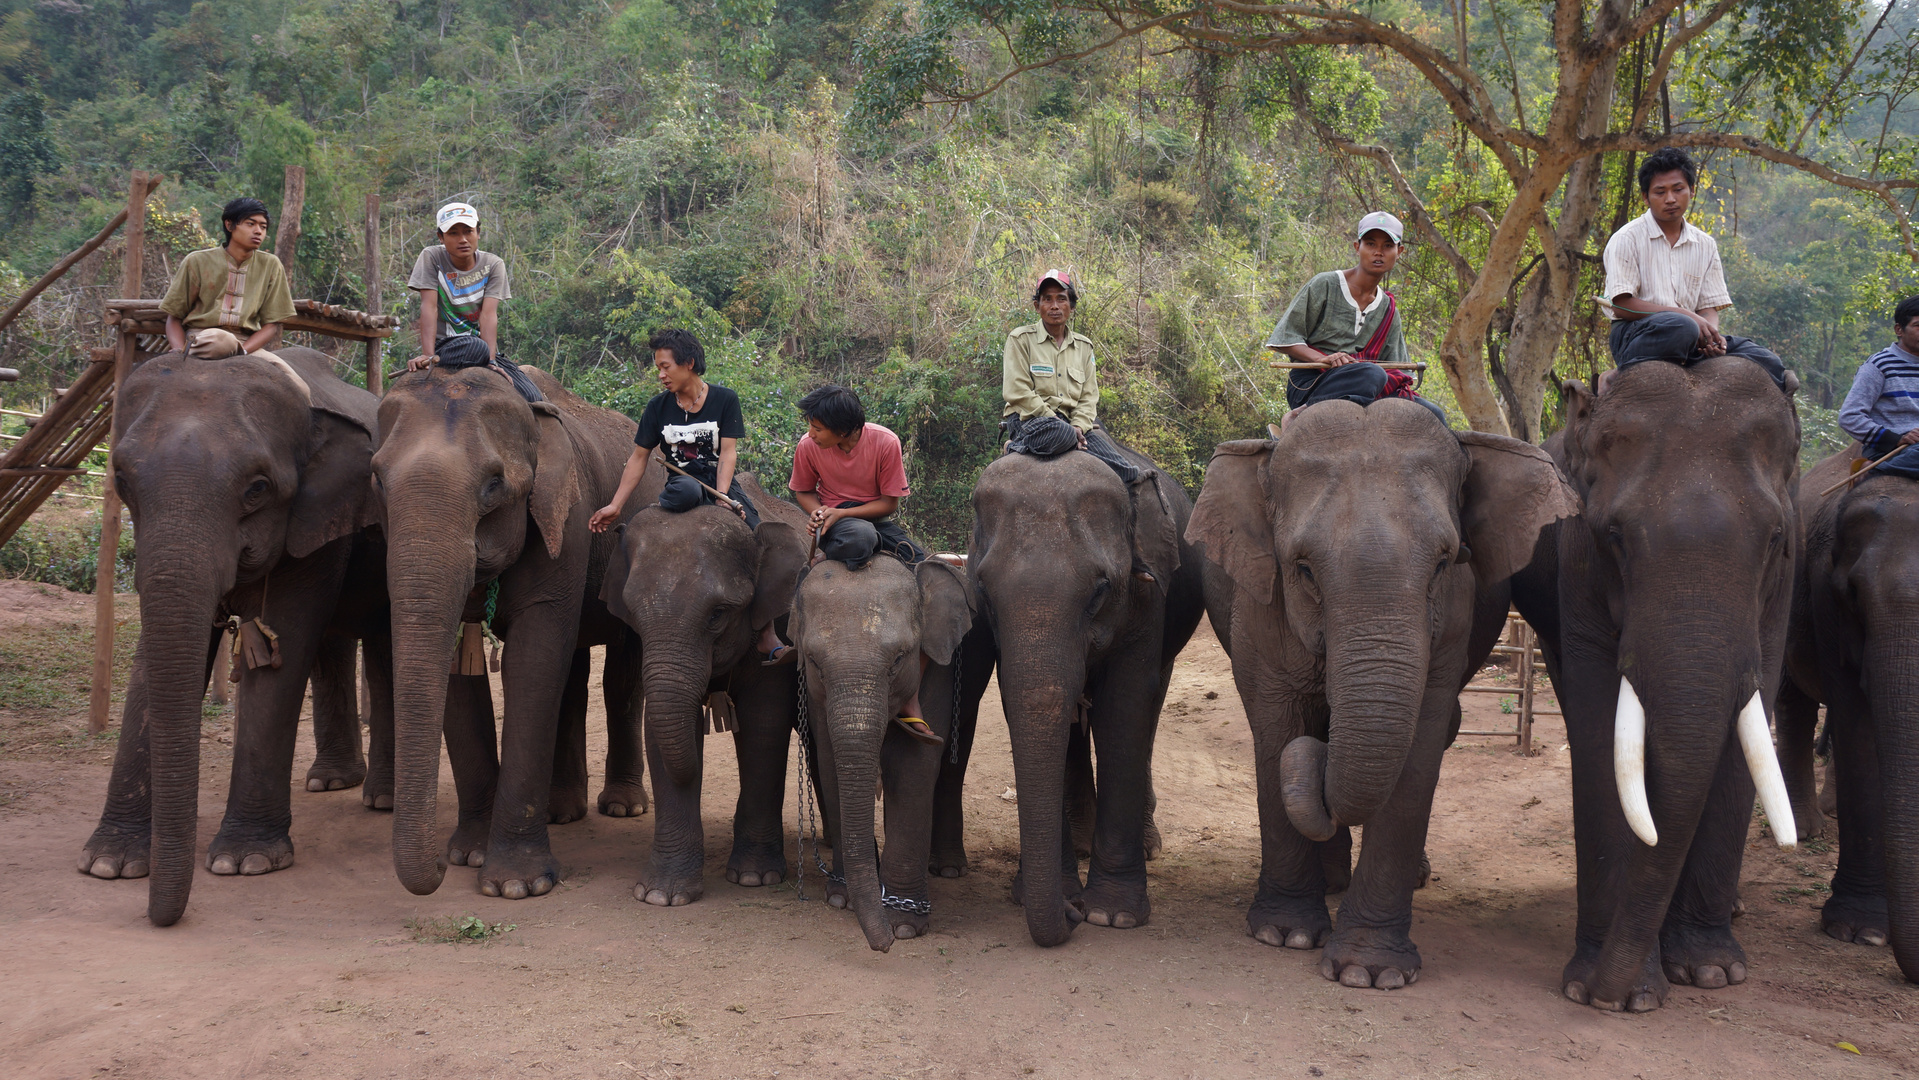 Elefantencamp im Hochland, Myanmar